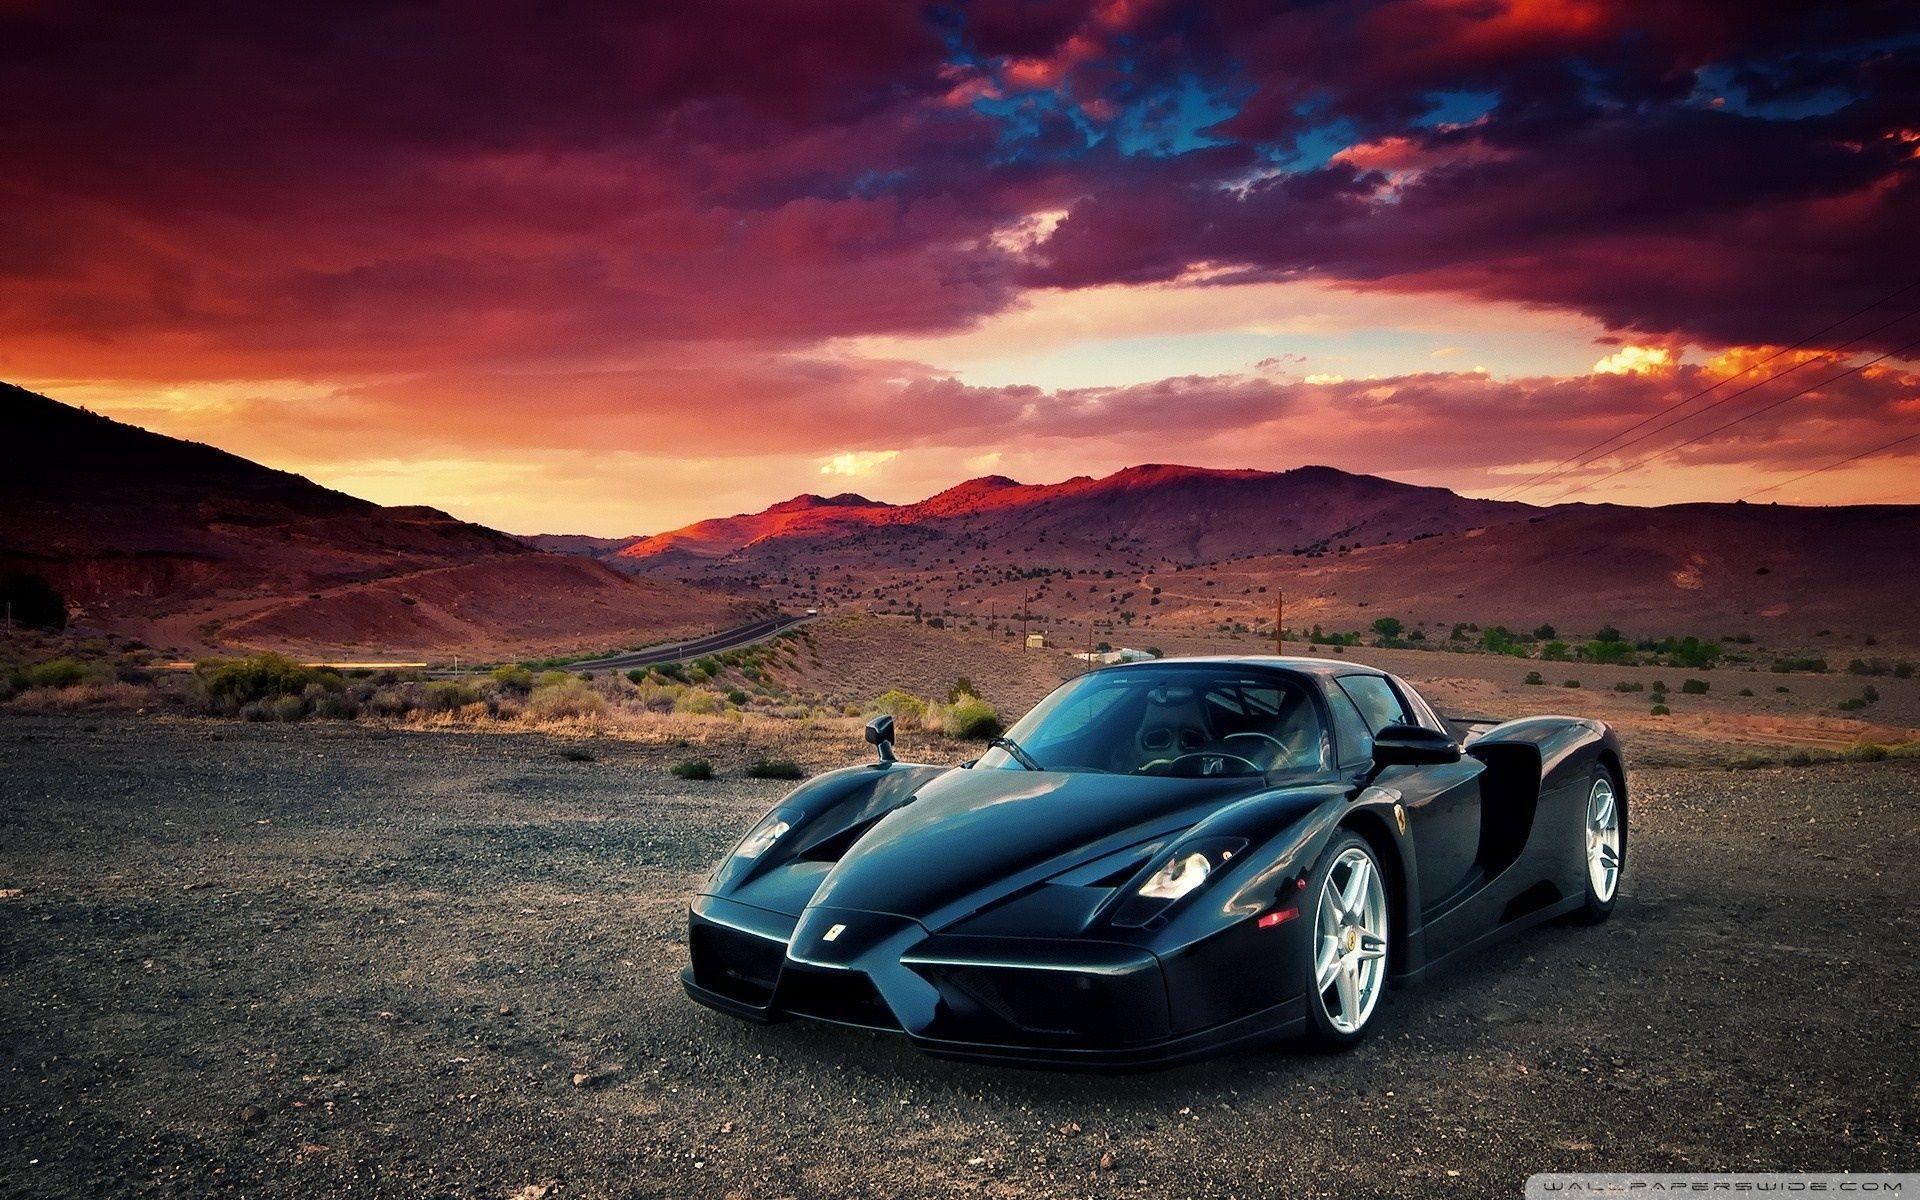 Ferrari Enzo Wallpapers Top Free Ferrari Enzo Backgrounds Wallpaperaccess